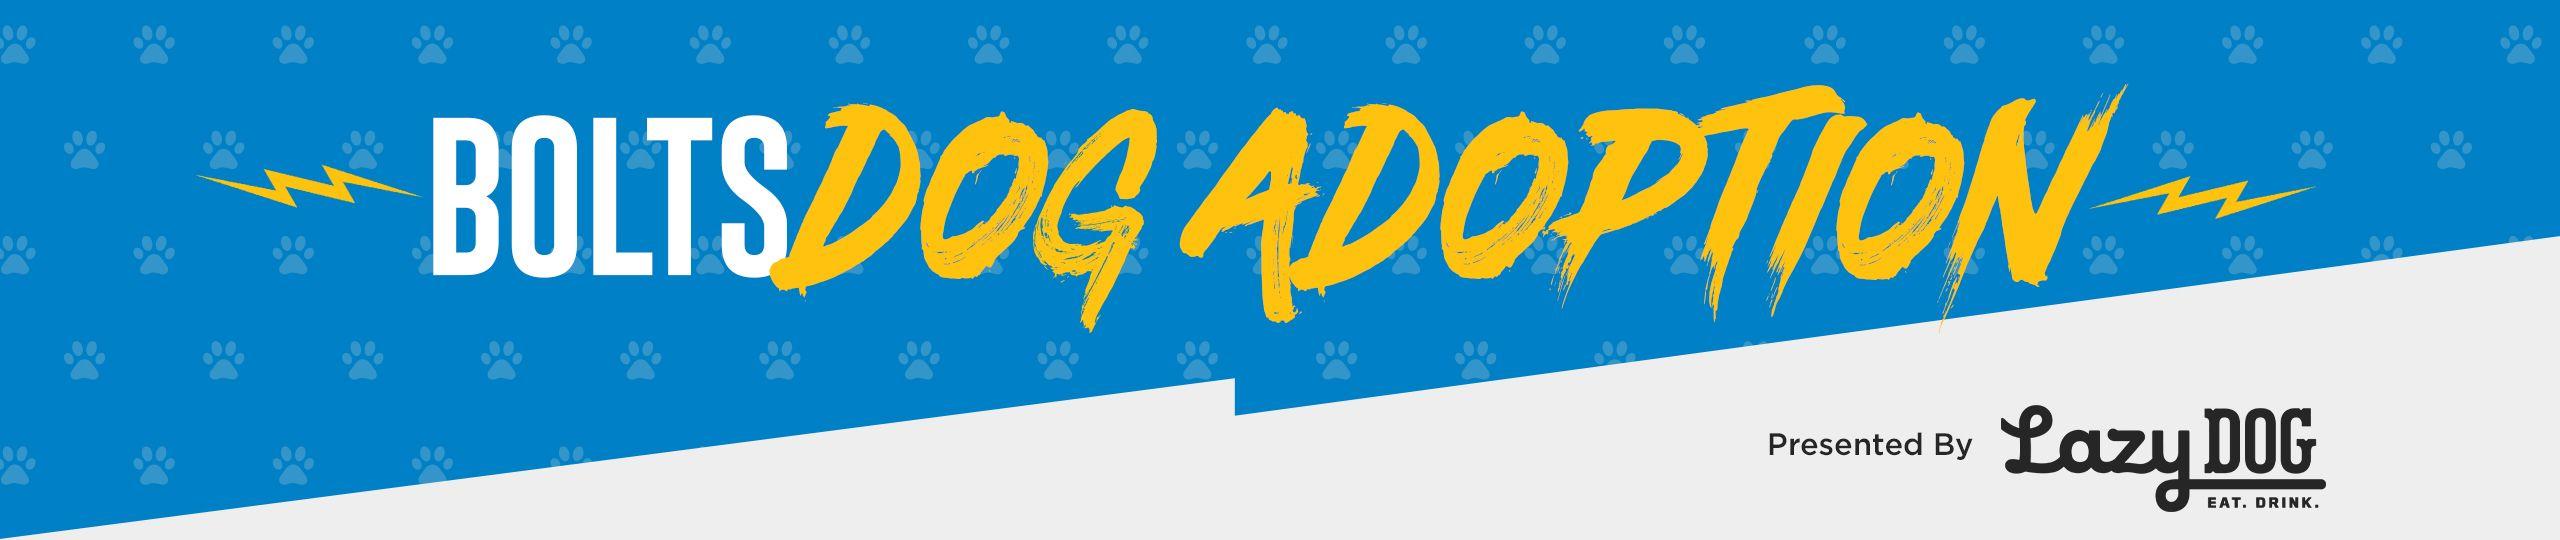 200828_Virtual_Dog_Adoption_Promos_Header